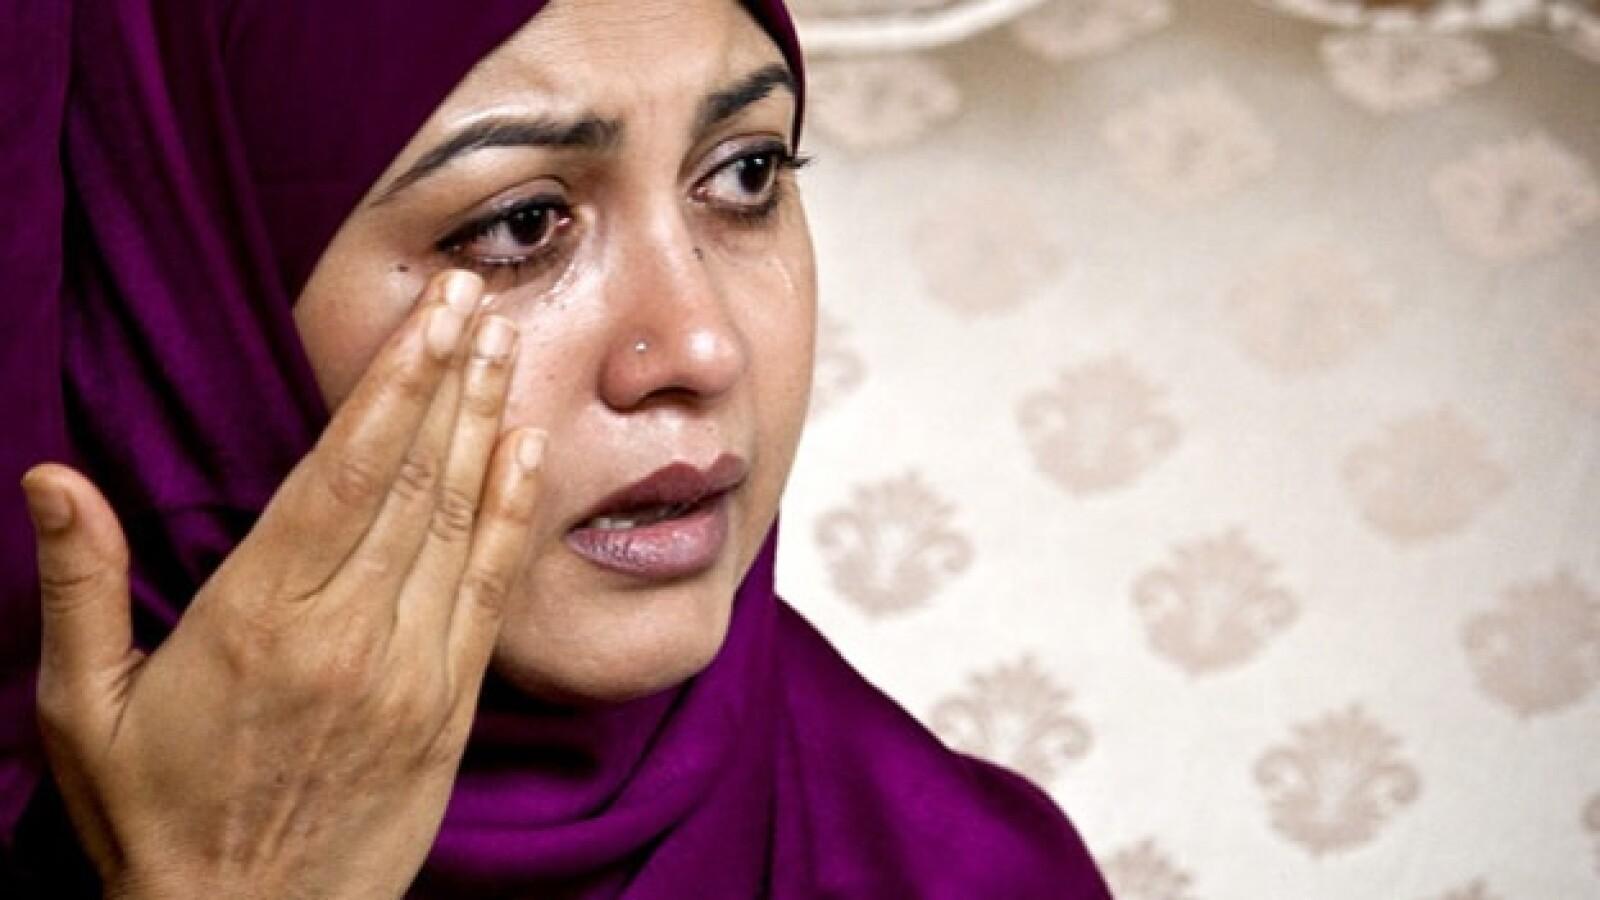 11-S - familia musulmana - Baraheen Ashrafi